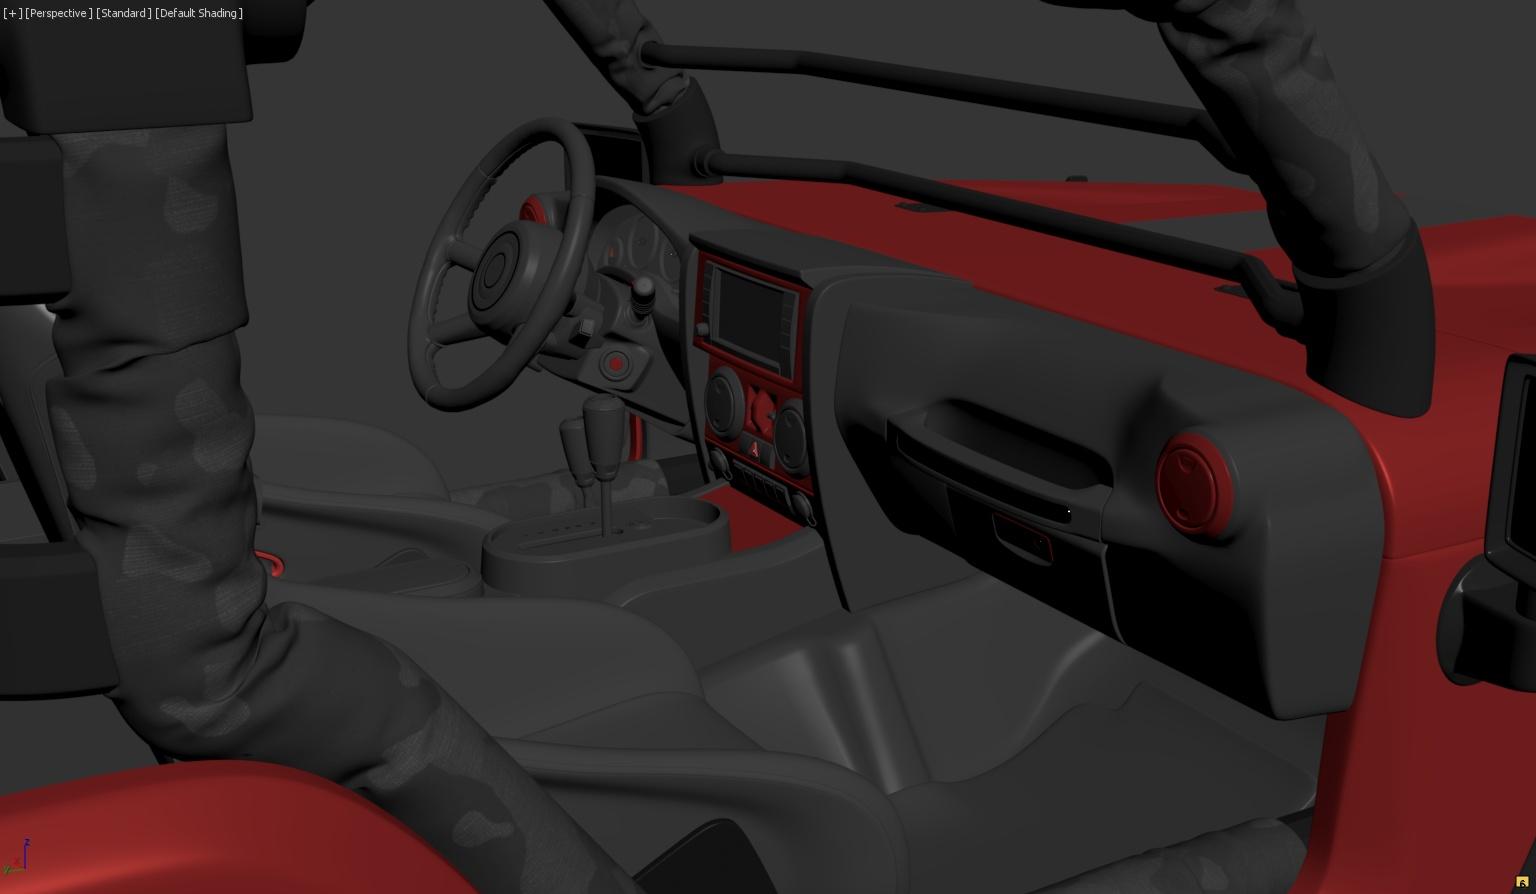 Jeep Shortcut - special edition